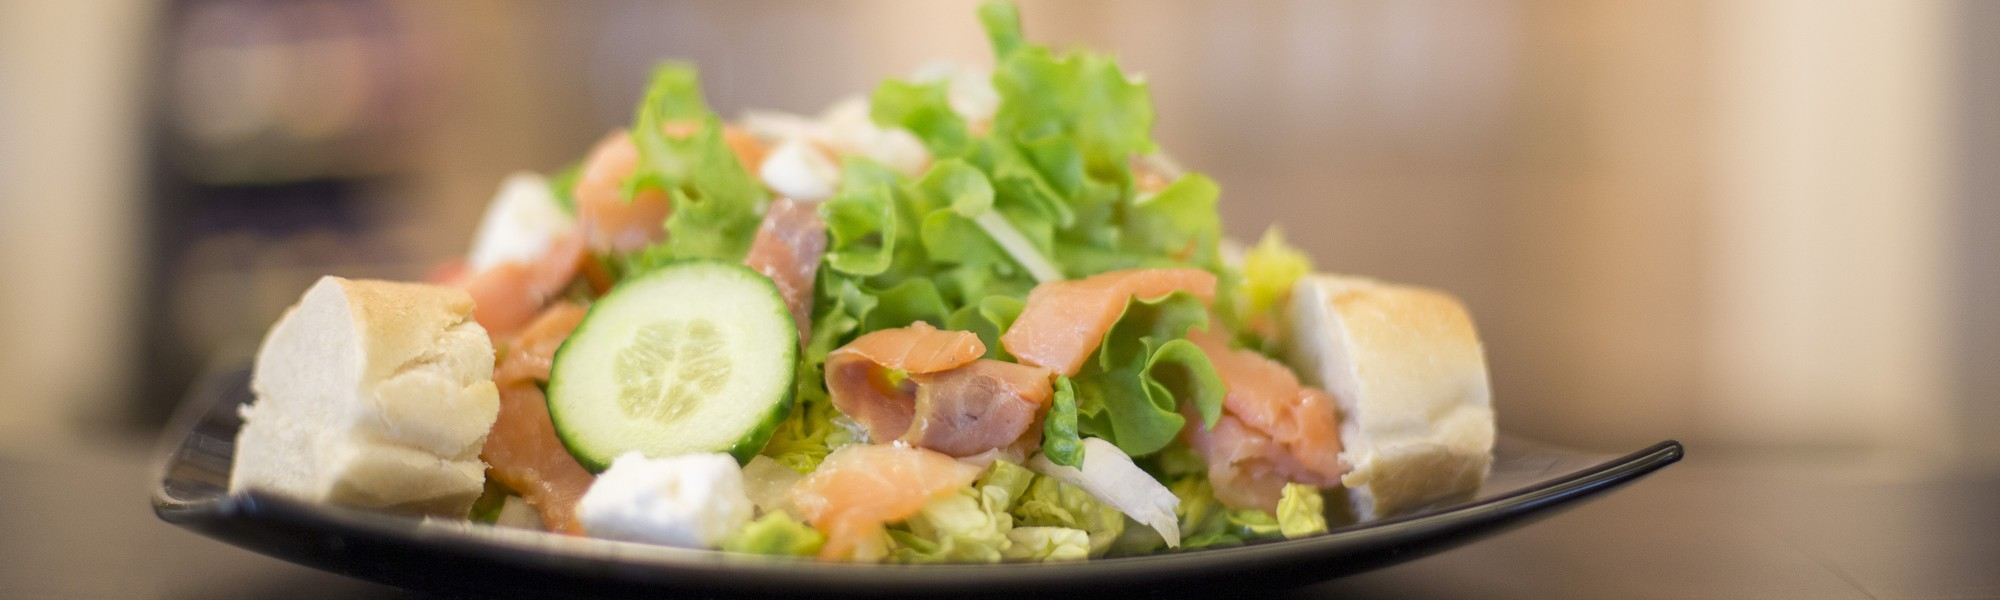 Sauna Bistro Salat